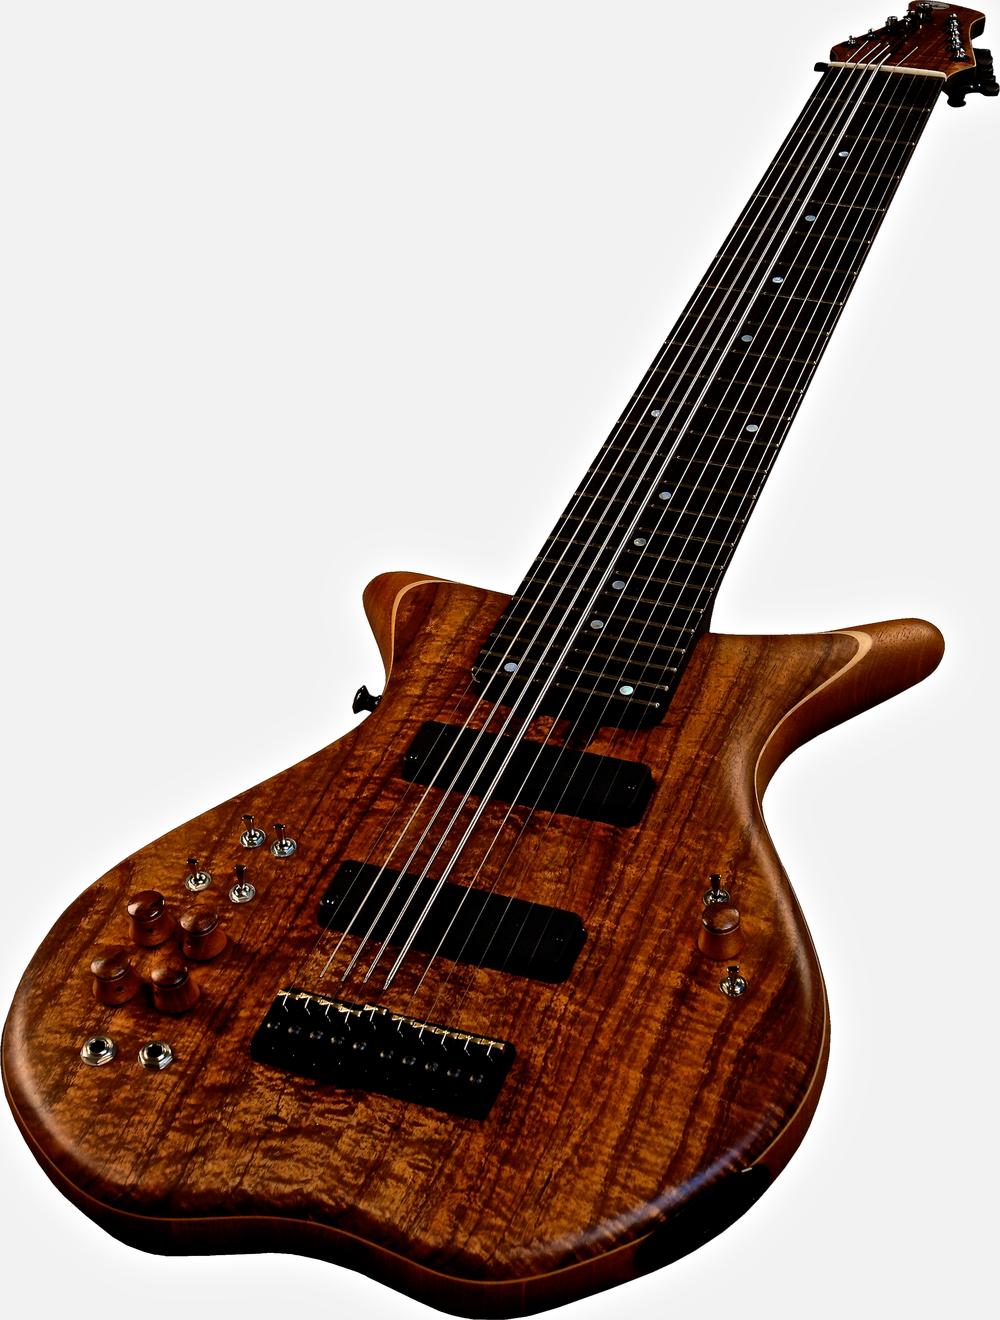 TGSS 10-String